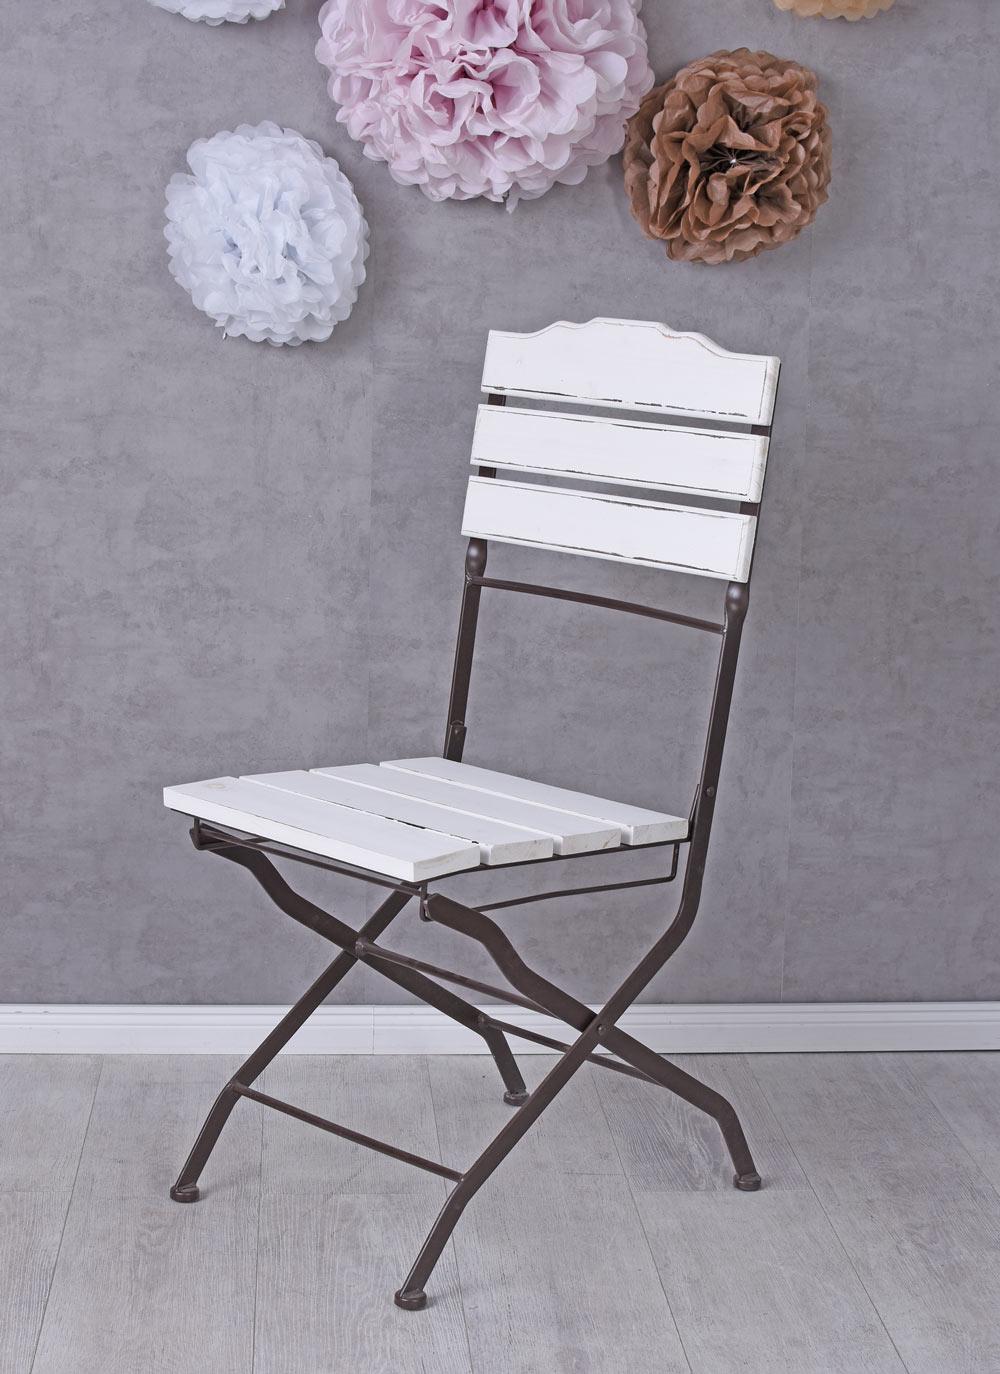 k chenstuhl shabby chic stuhl klappstuhl esszimmerstuhl gartenstuhl holzstuhl ebay. Black Bedroom Furniture Sets. Home Design Ideas